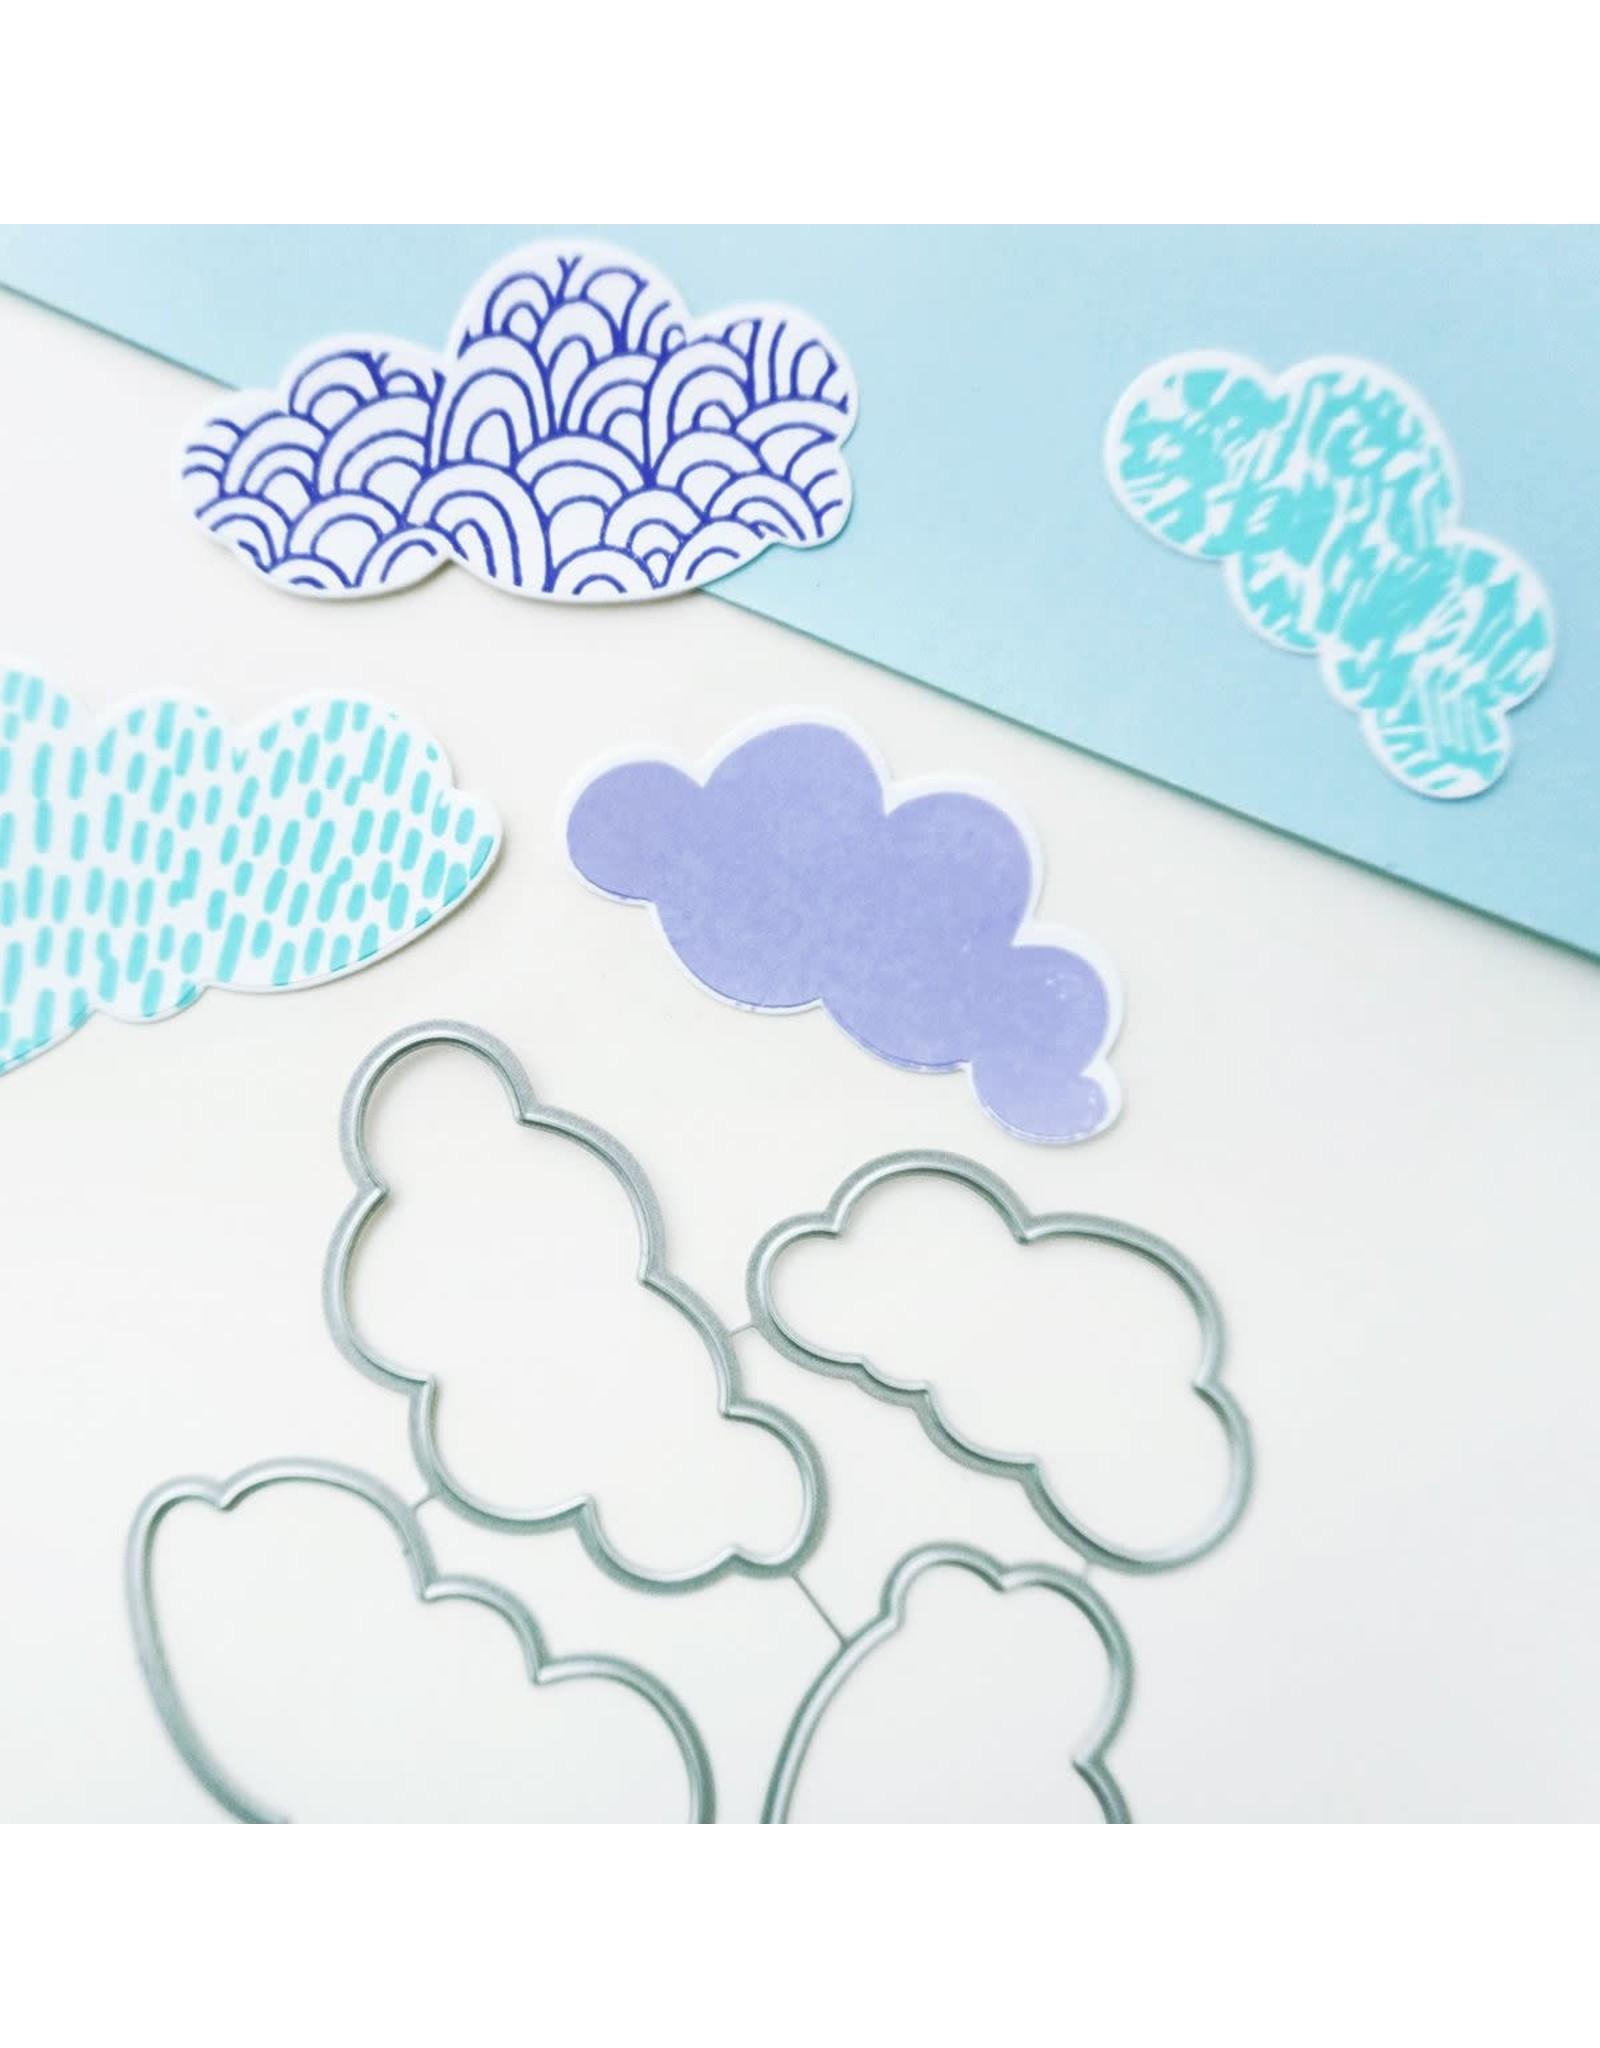 Catherine Pooler Designs April Showers Dies